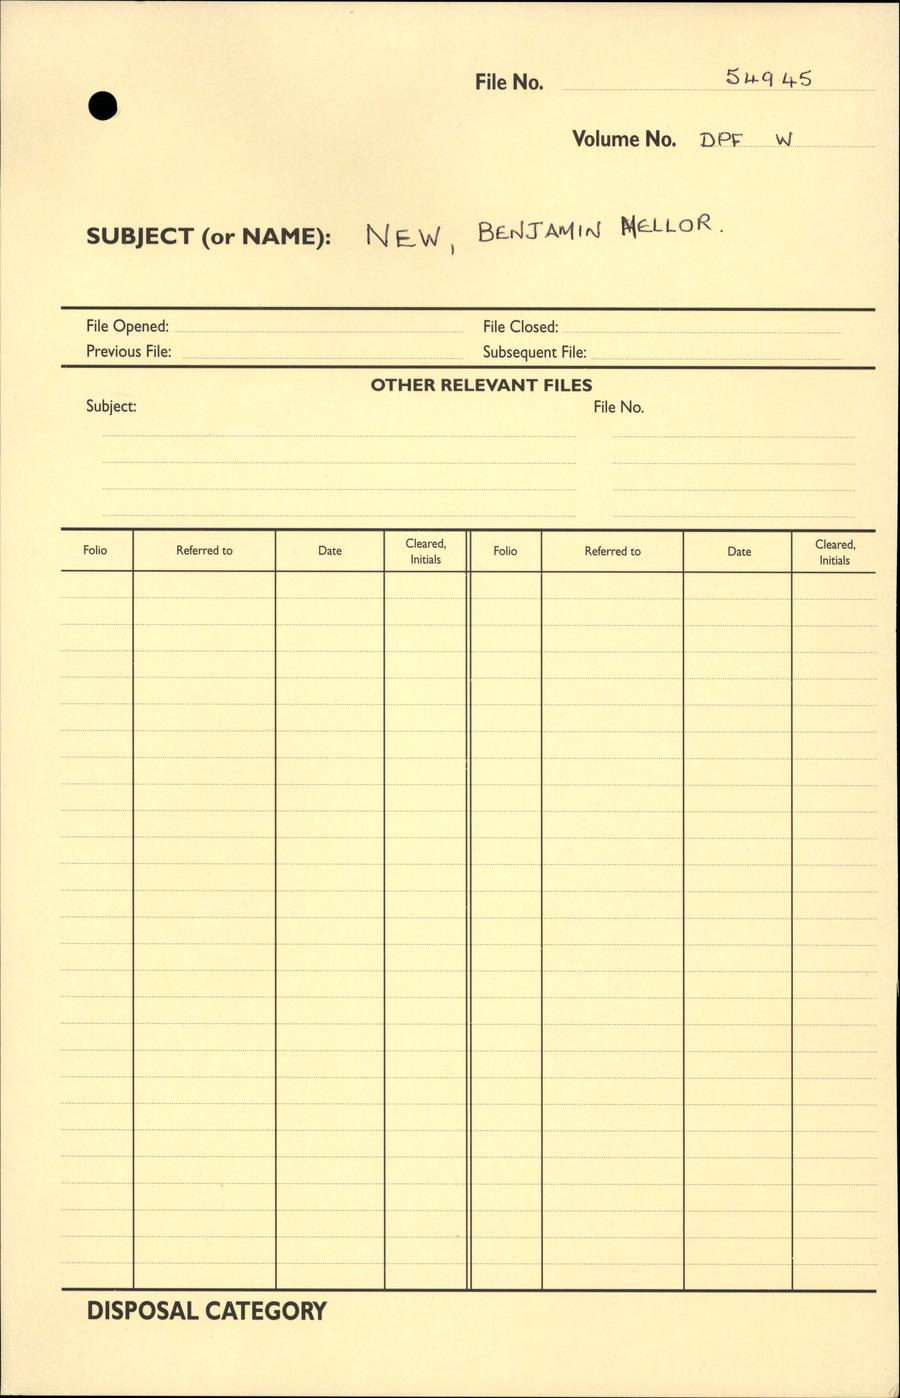 NEW, Benjamin Mellor - WW1 54945 - DPF [Duplicate Personnel File]